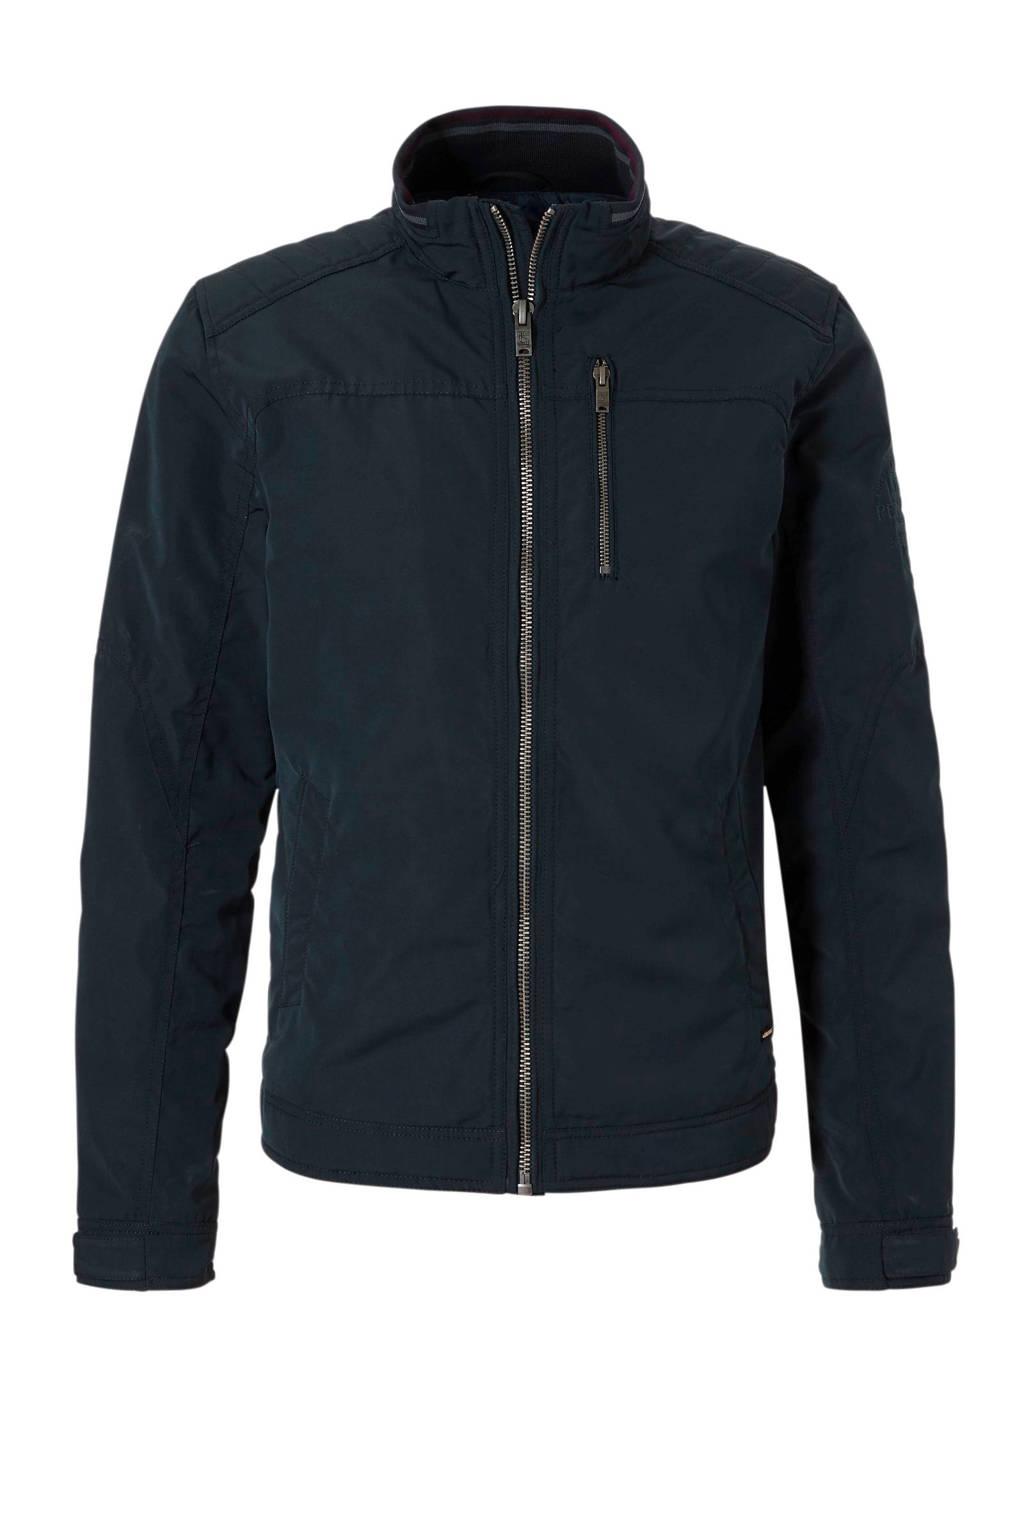 Petrol Industries jas, Donkerblauw